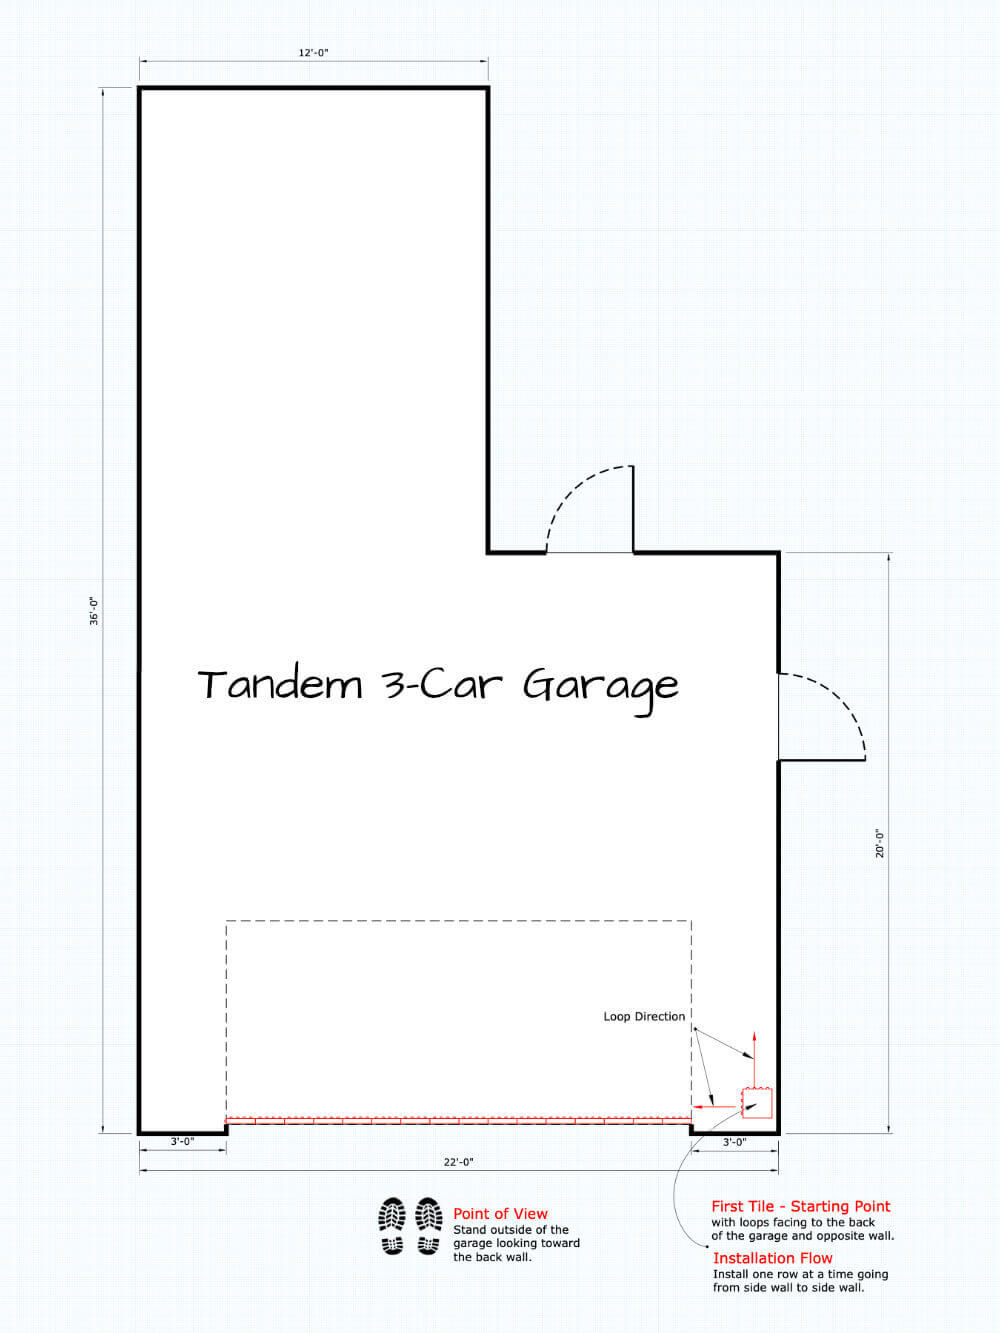 Interlocking Garage Tile Installation - Door at Short Side